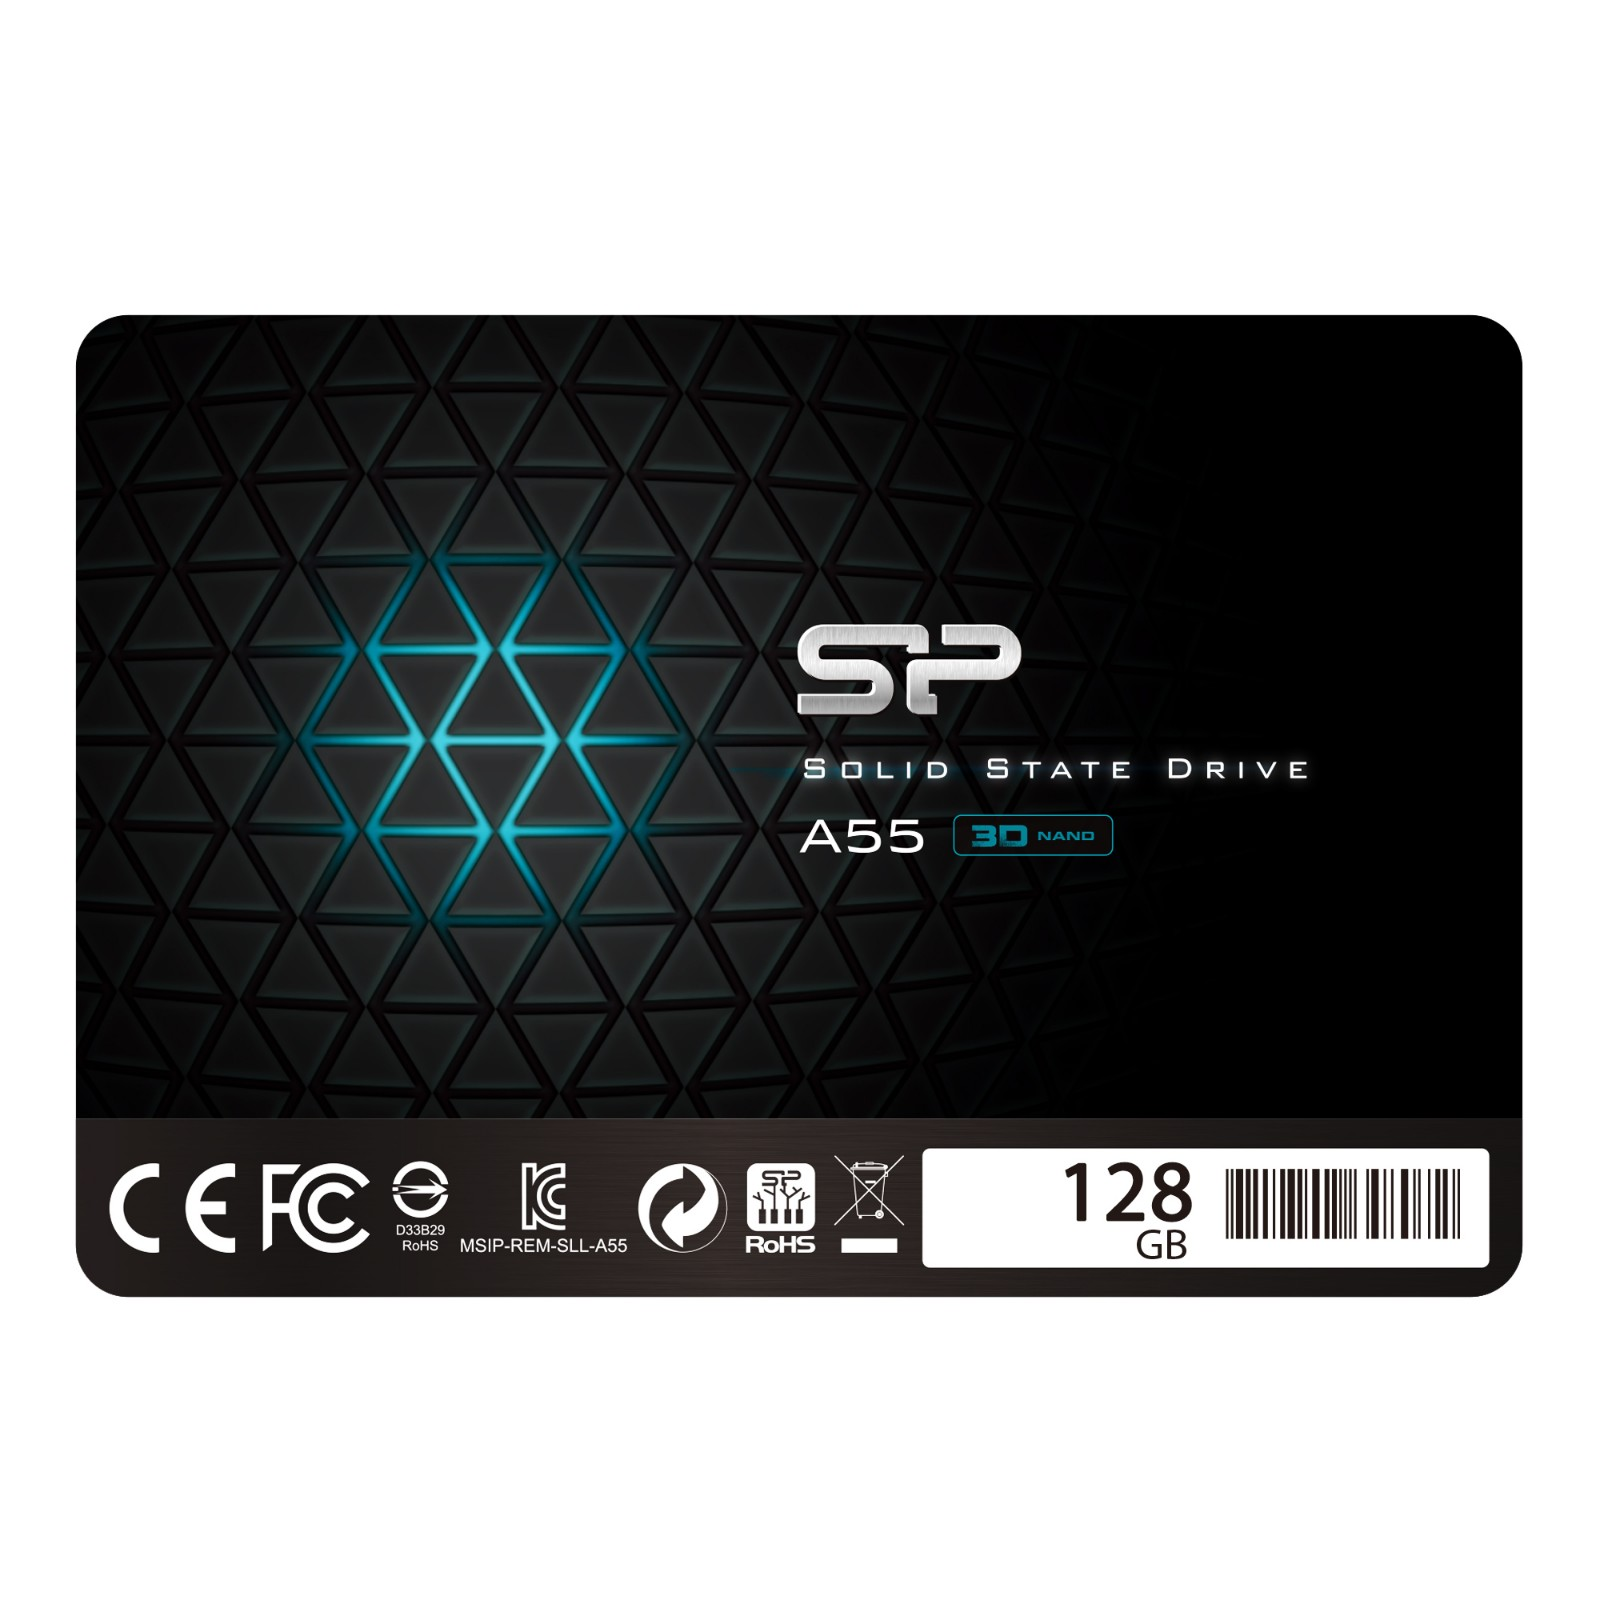 Silicon Power A55 128GB TLC 3D NAND 2.5in SATA SSD